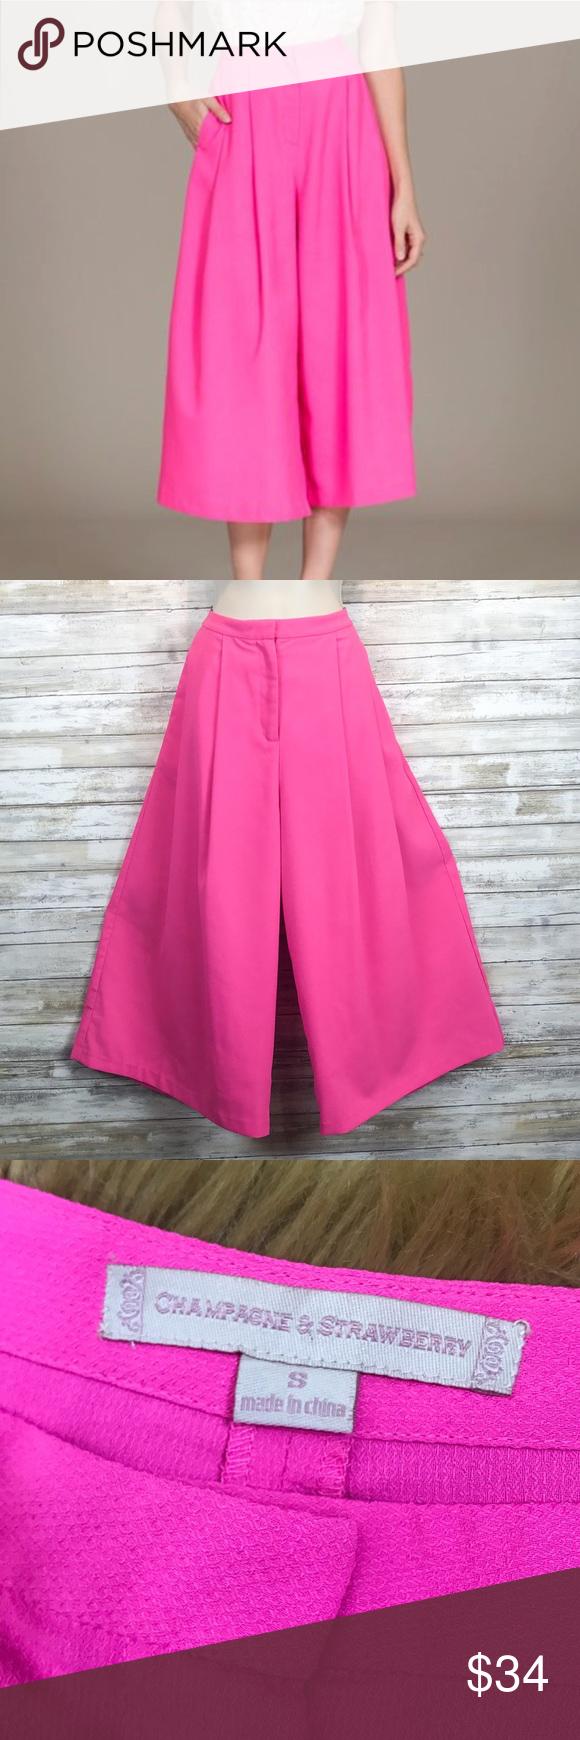 dff5a16fa037 Champagne   Strawberry gaucho pants sz S Champagne   Strawberry pink gaucho  pants 100% polyester